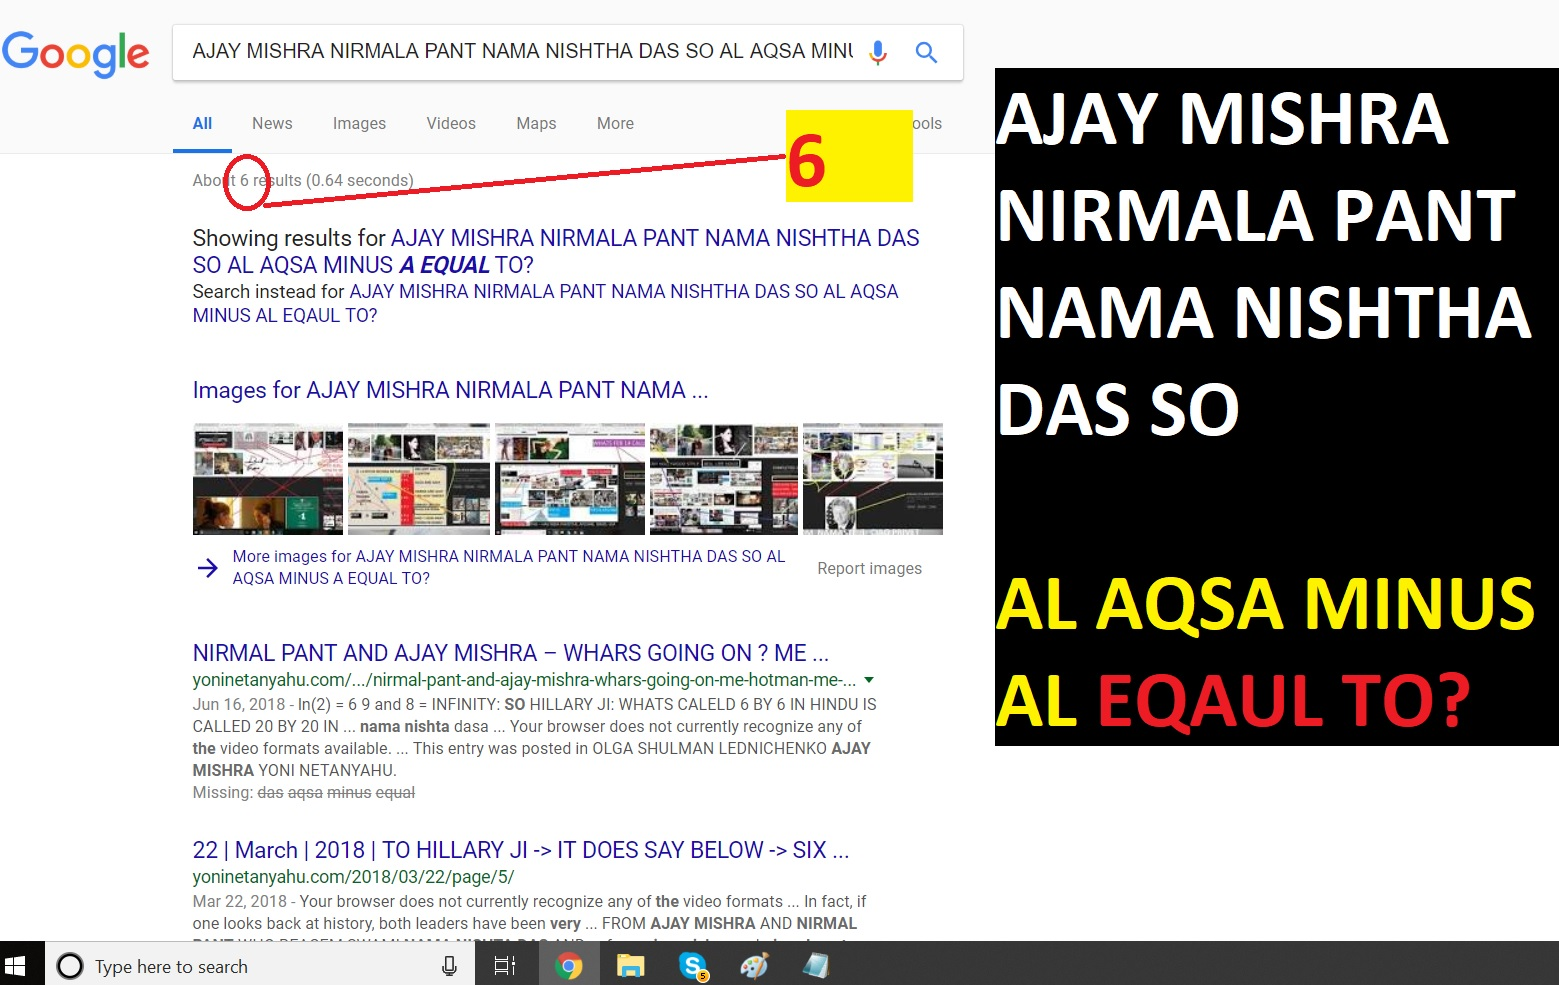 AJAY MISHRA NIRMALA PANT NAMA NISHTHA DAS SO AL AQSA MINUS AL EQAUL TO